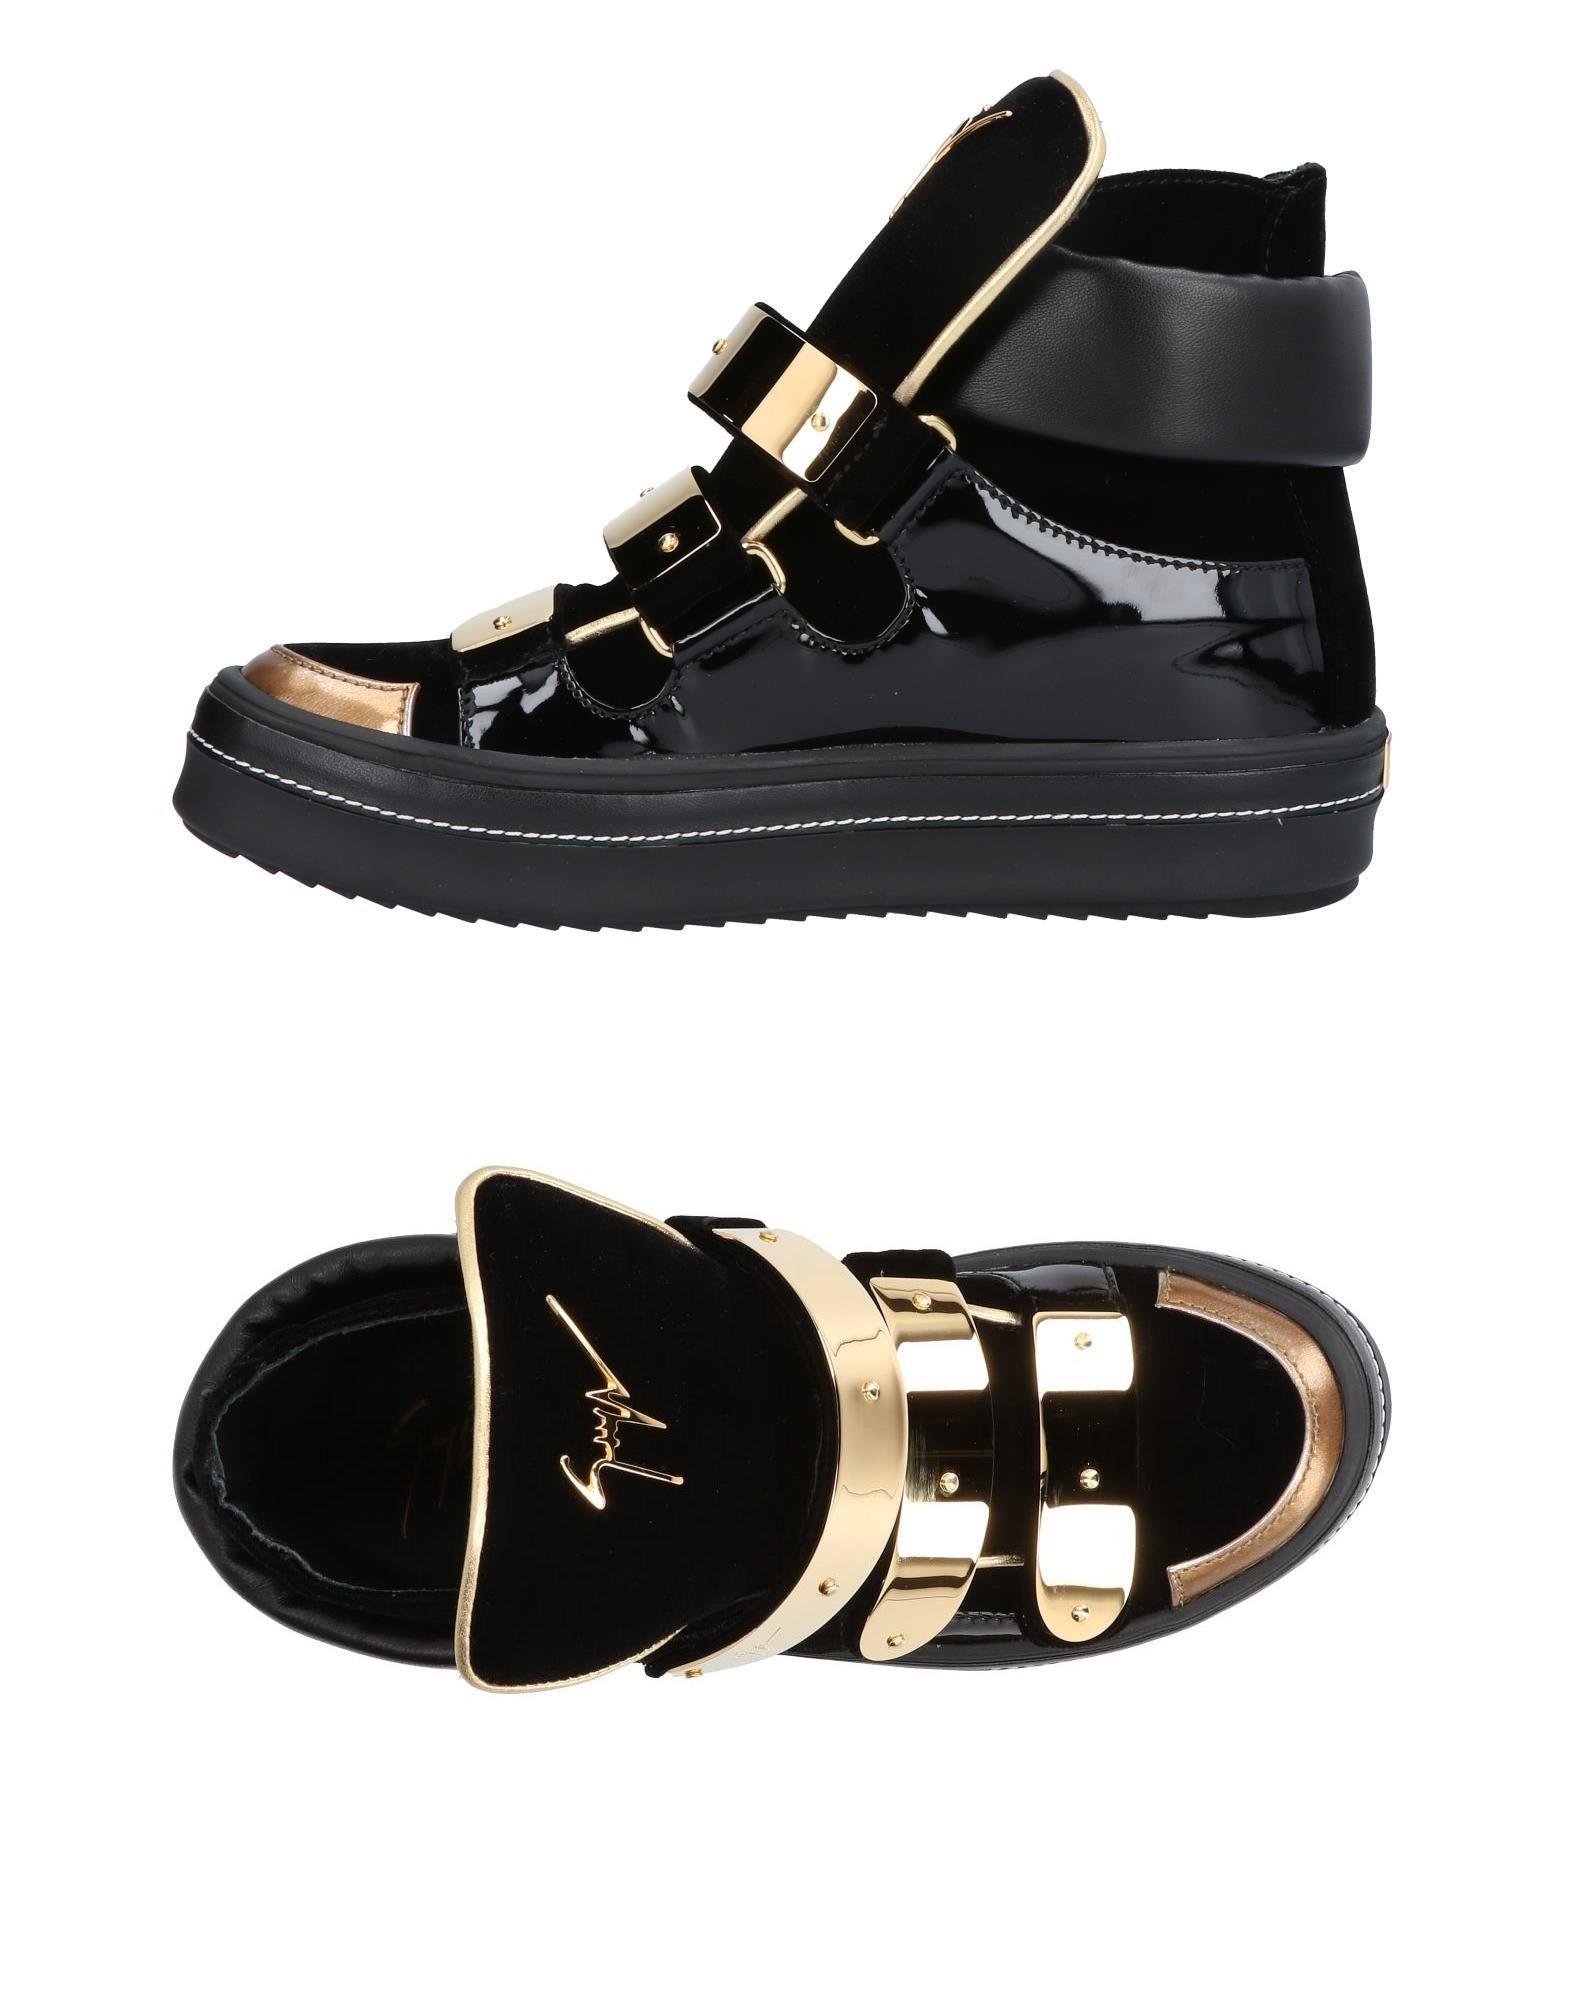 Giuseppe Zanotti Sneakers Sneakers - Women Giuseppe Zanotti Sneakers Sneakers online on  Canada - 11430670AQ 79e1f1